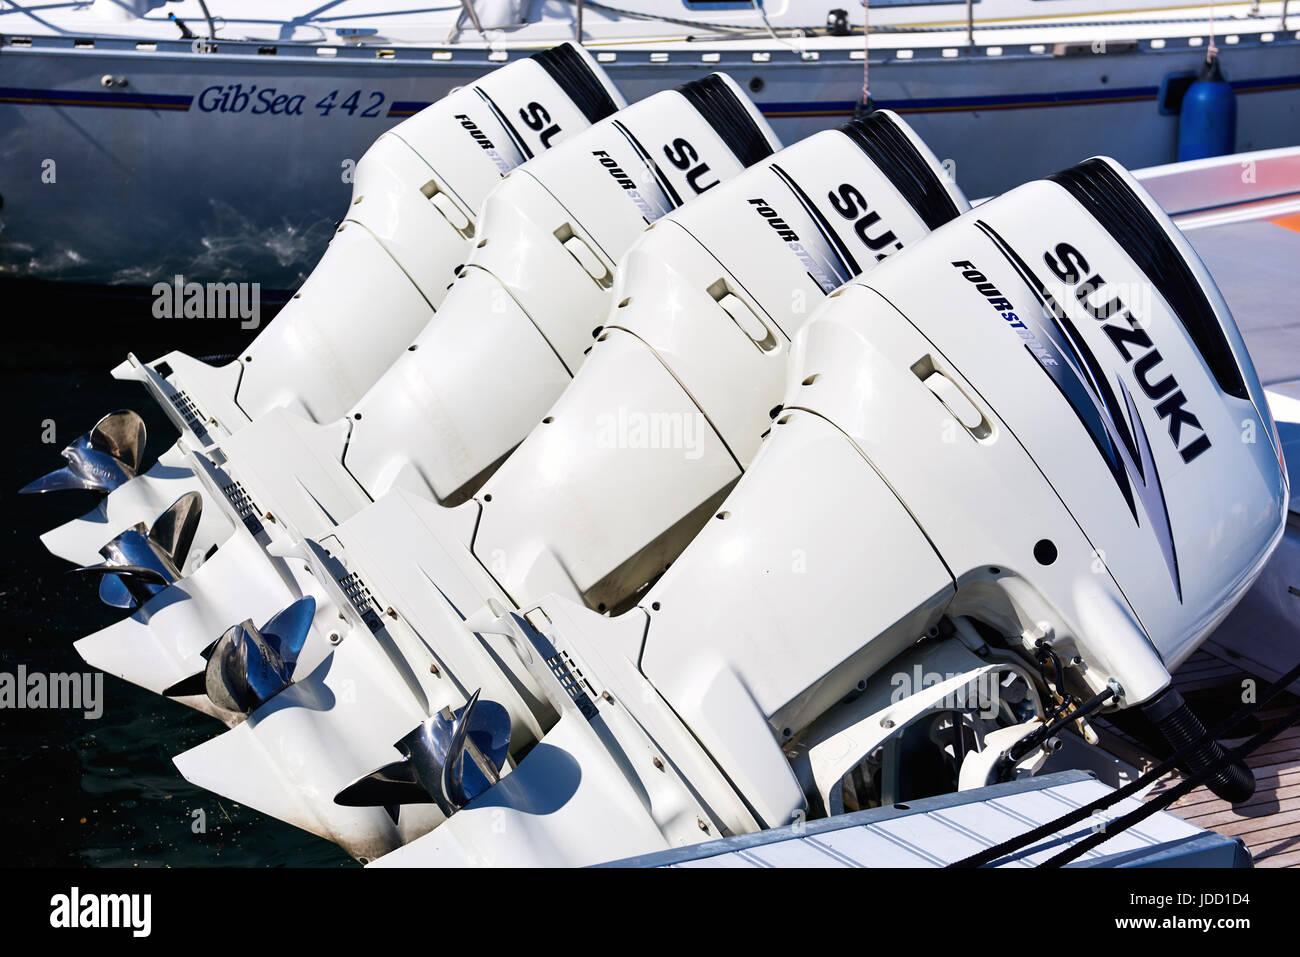 Suzuki Engine Stock Photos & Suzuki Engine Stock Images - Alamy